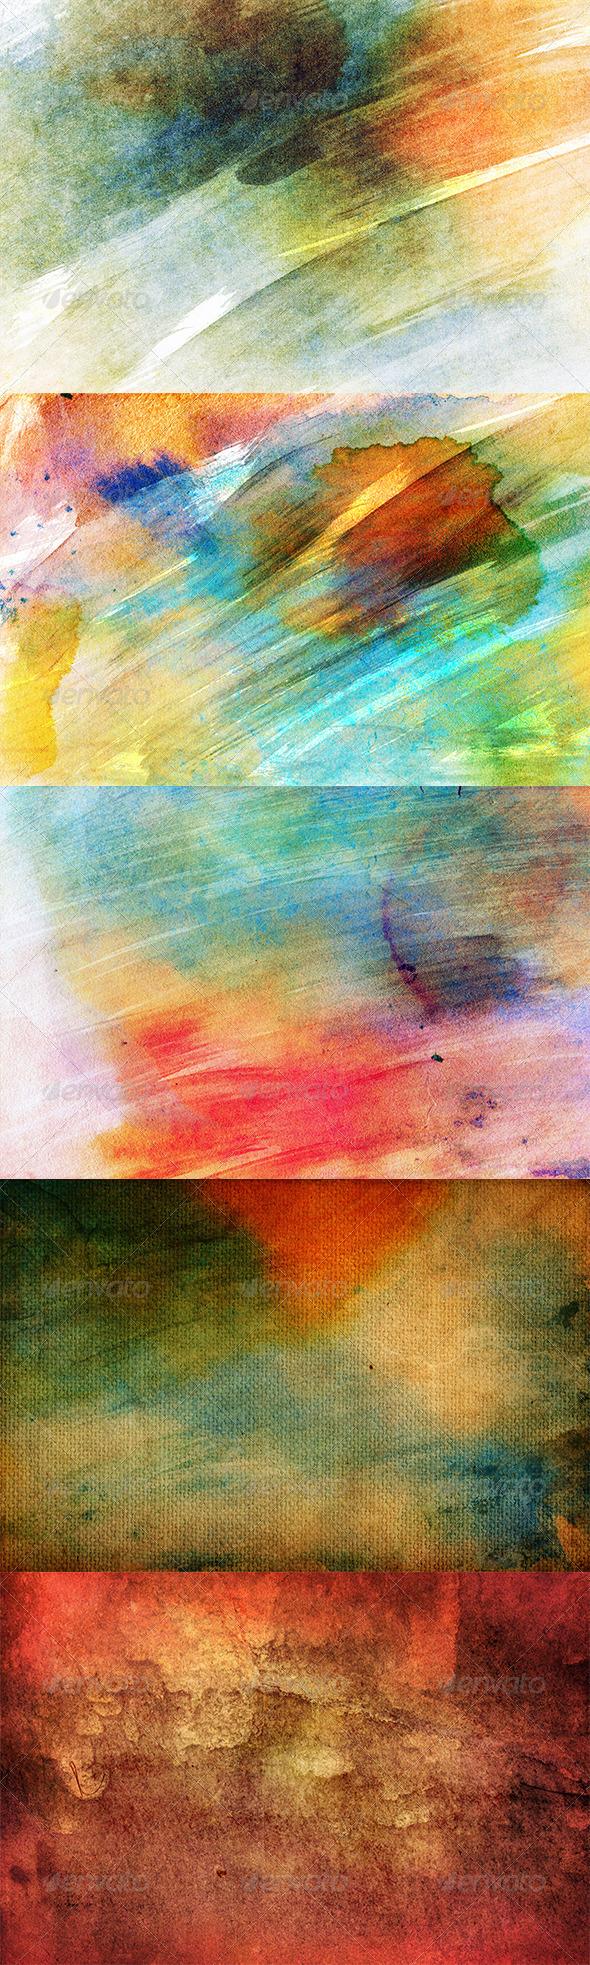 Vintage Watercolor Textures 2